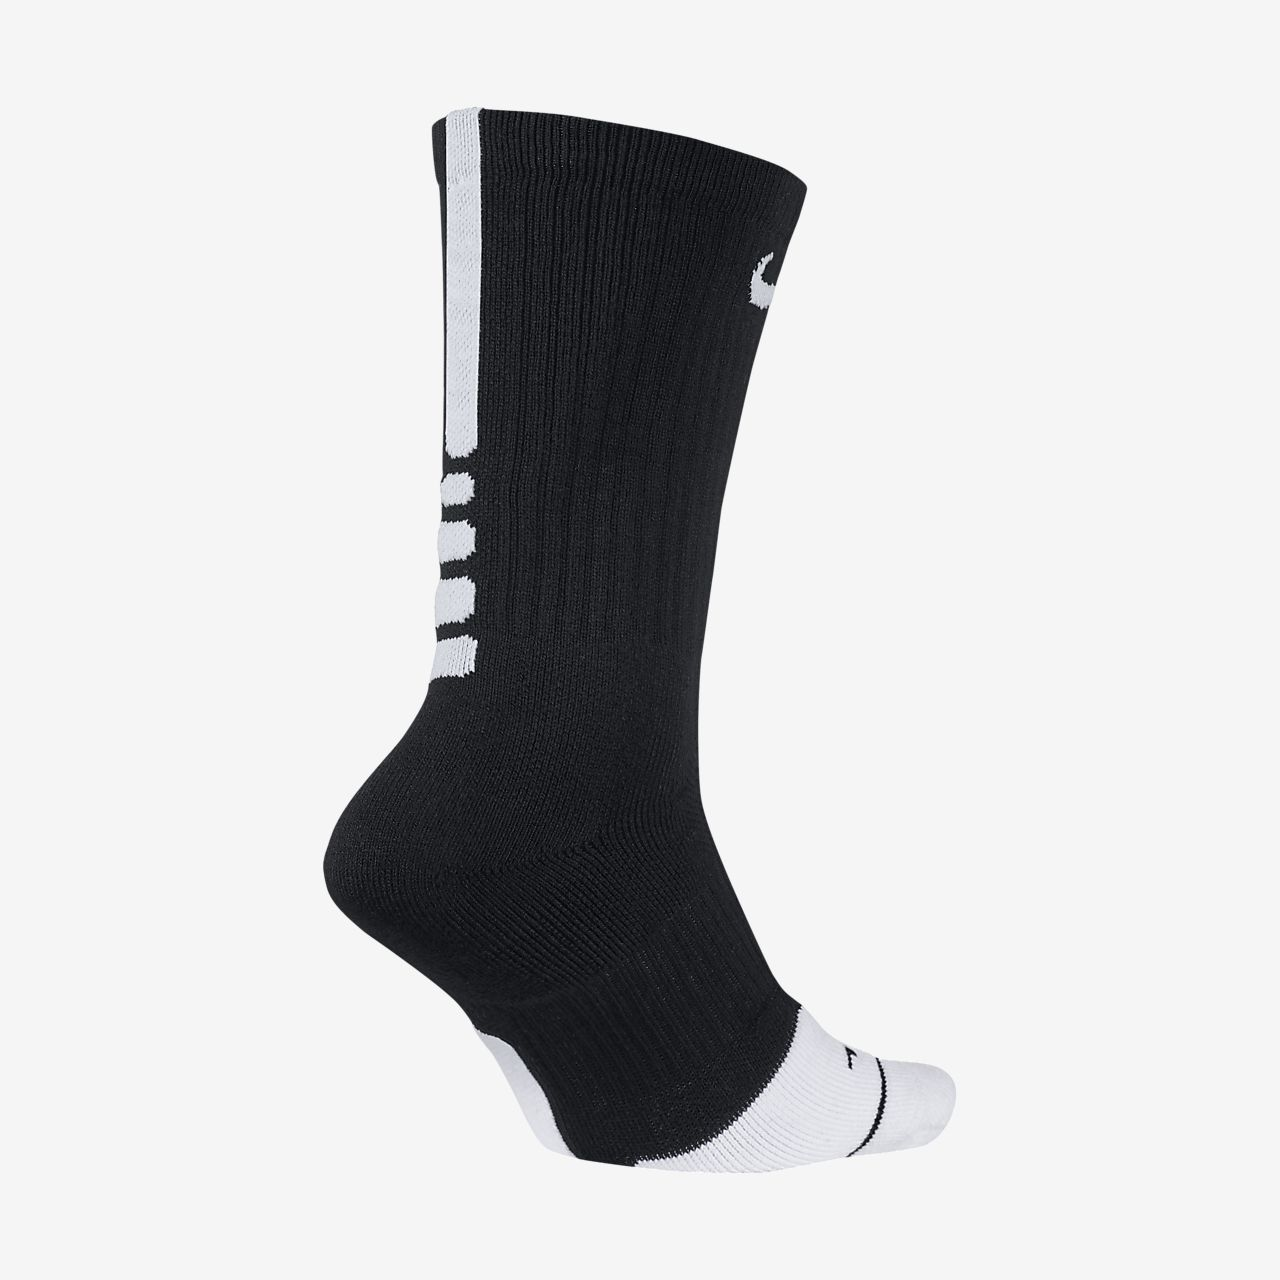 Calcetines de básquetbol Nike Dry Elite 1.5 Crew